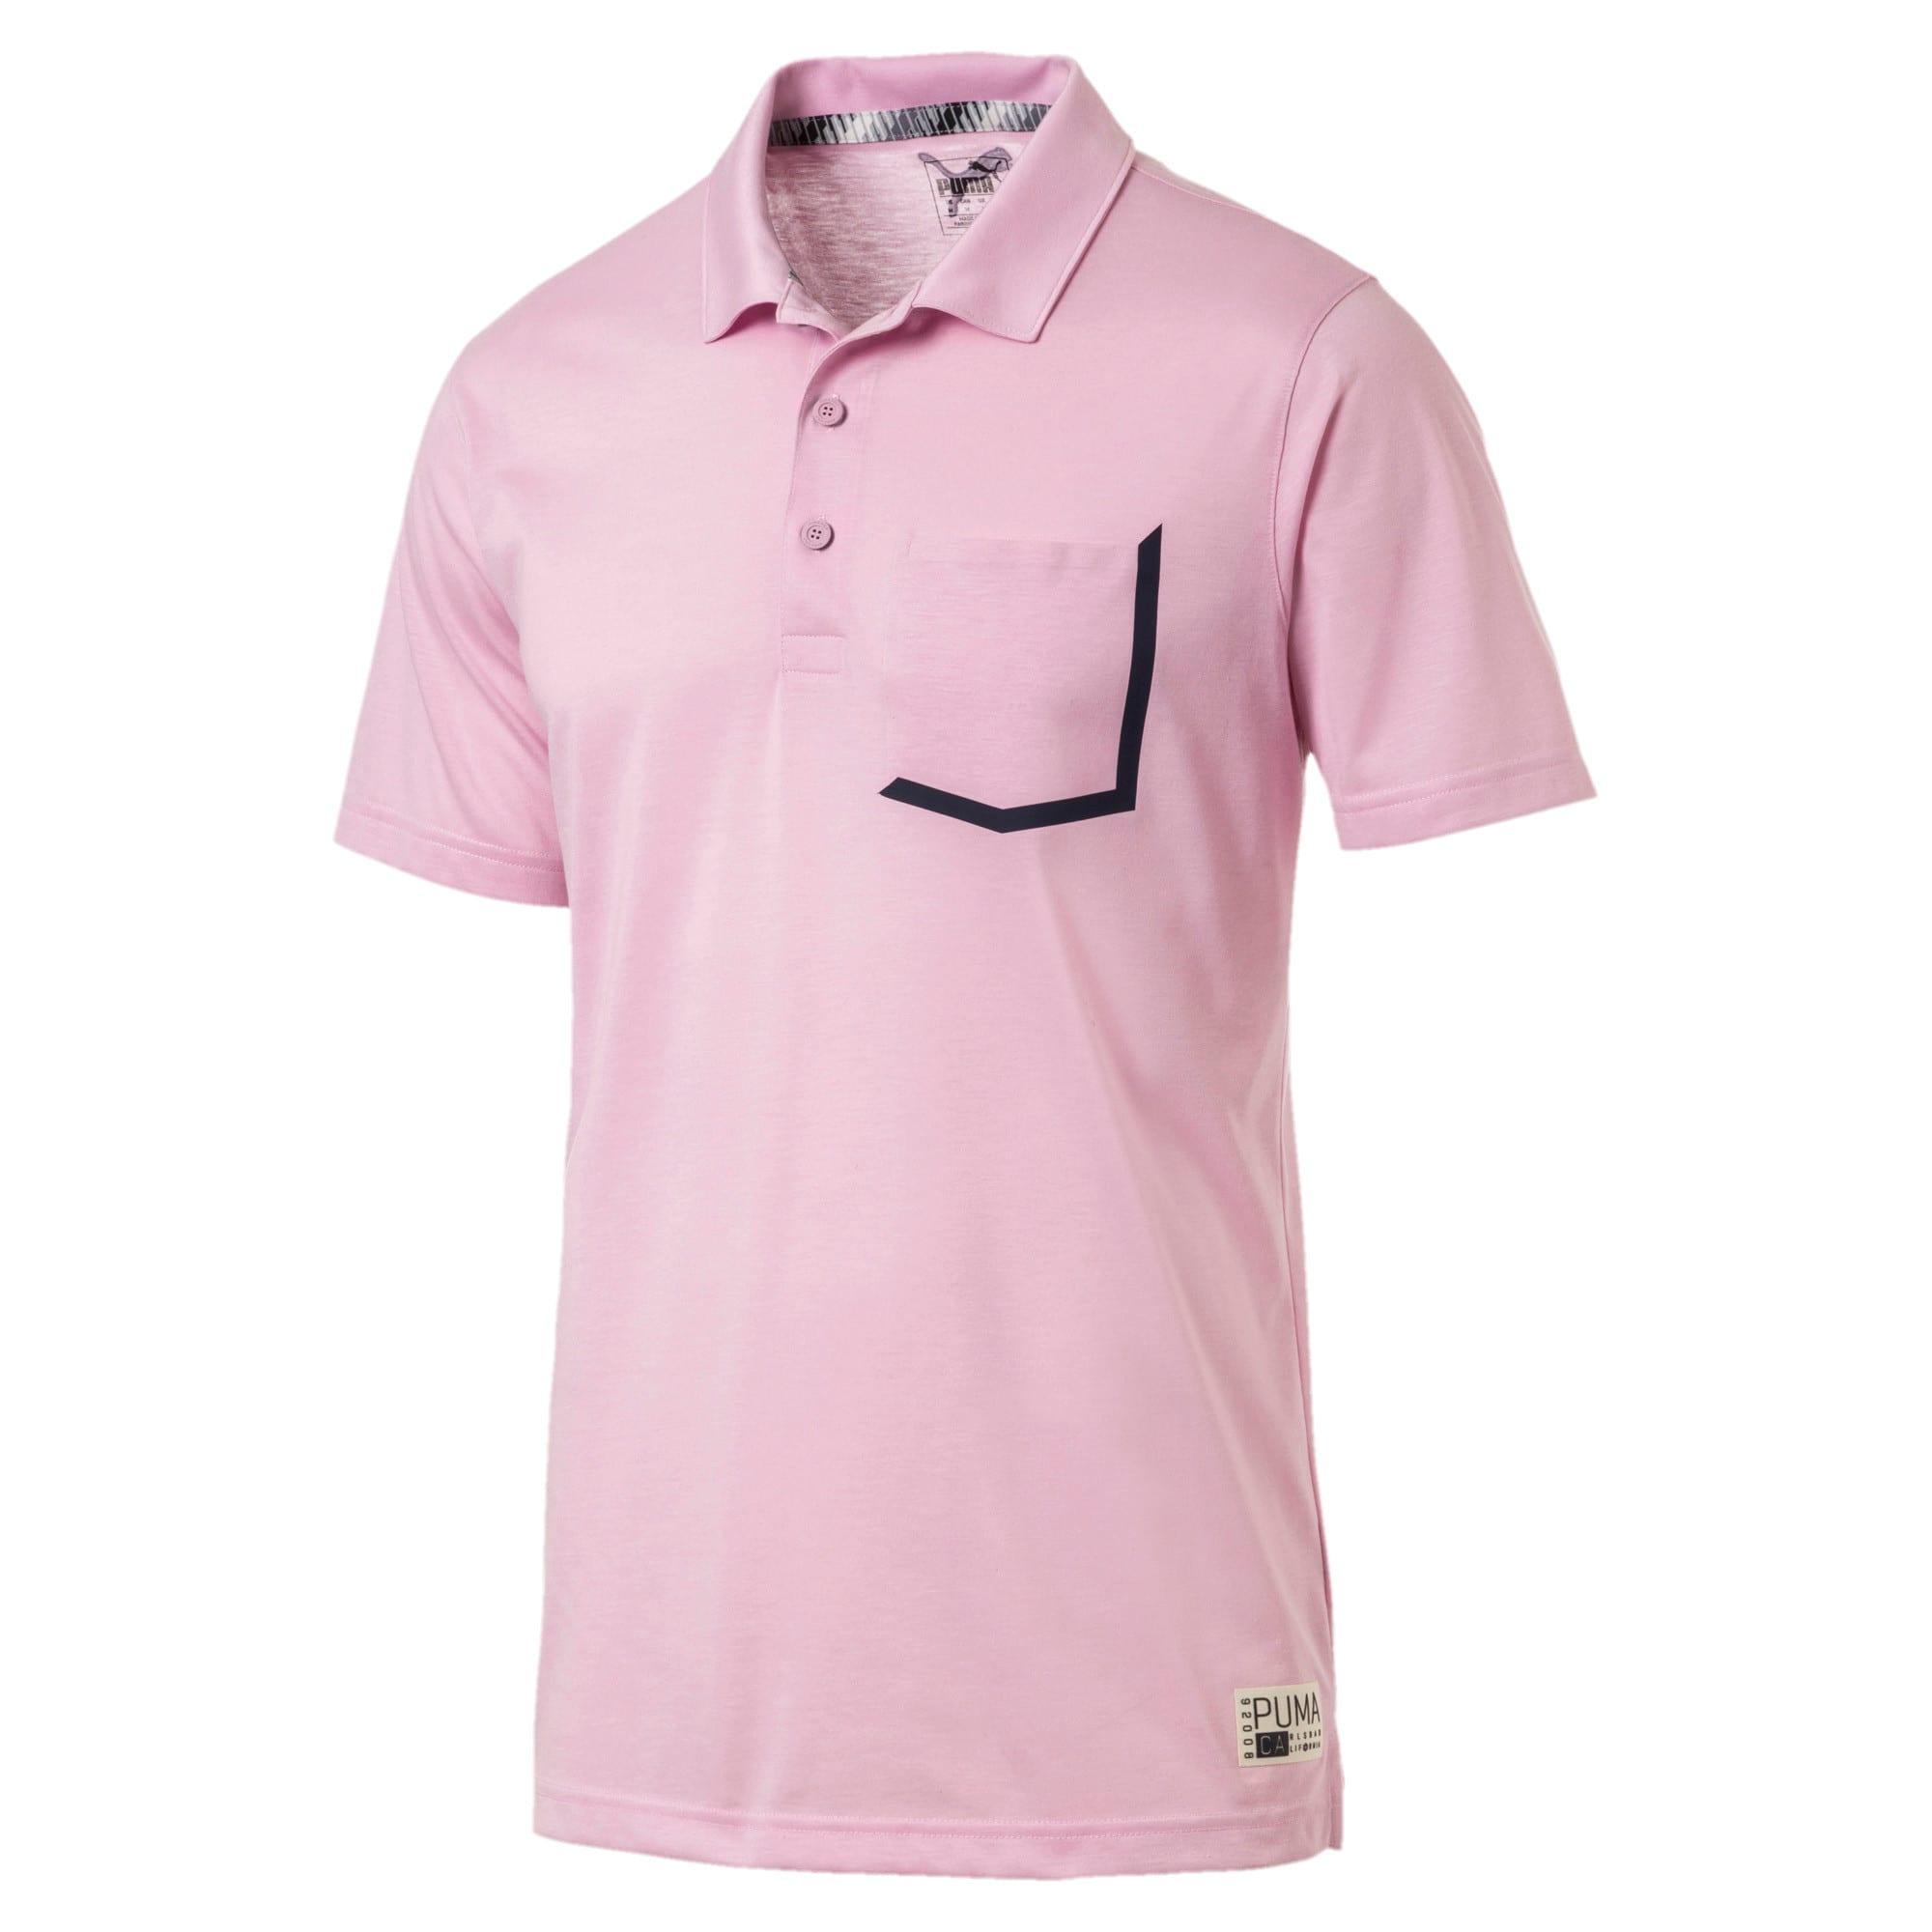 Miniatura 1 de Camiseta tipo polo Faraday para hombre, Pale Pink, mediano